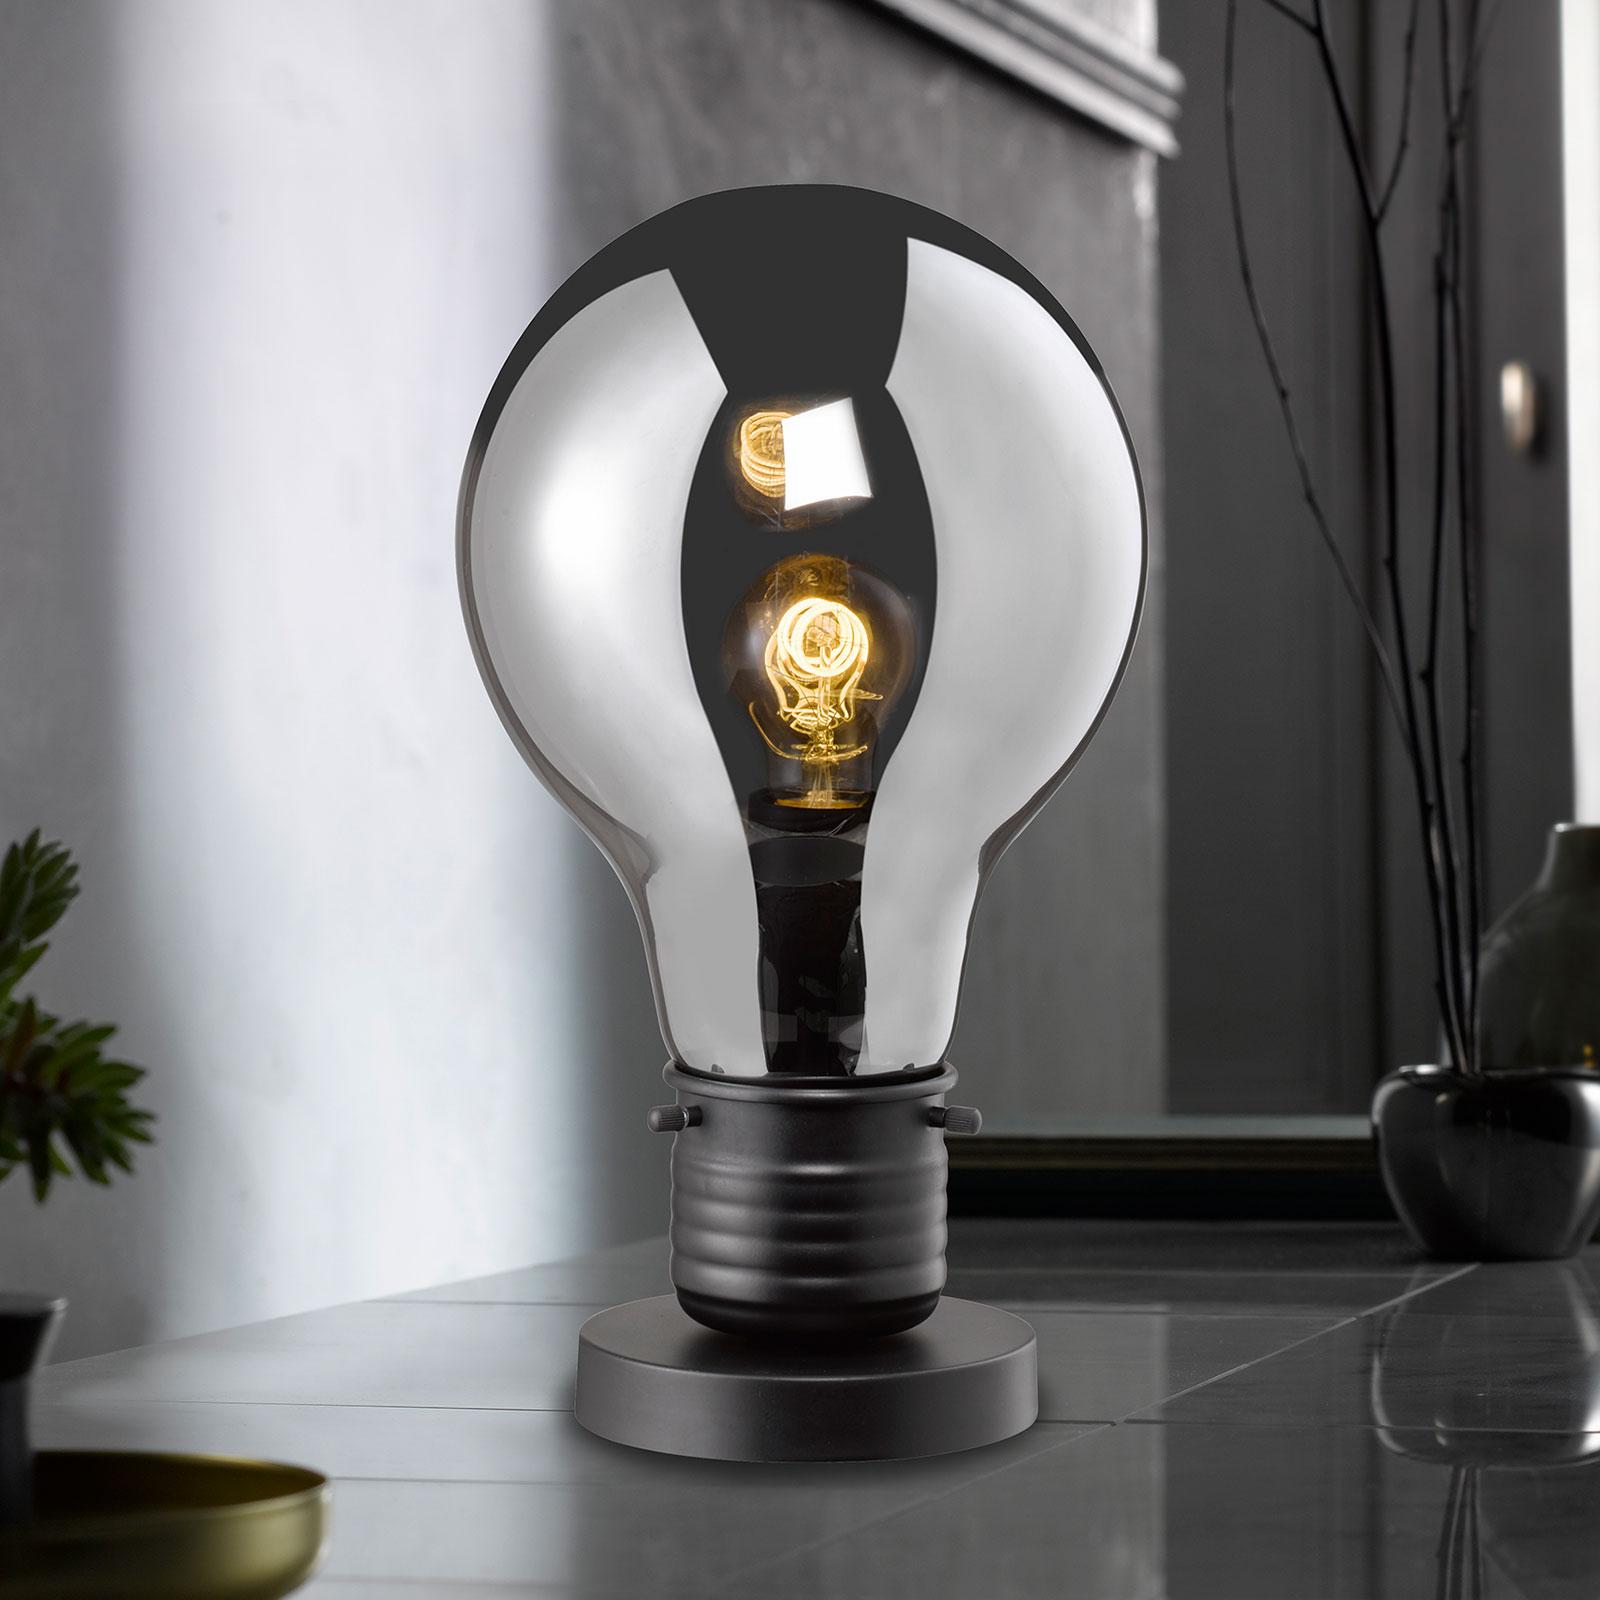 Tafellamp Louis met getinte glazen kap, 37 cm